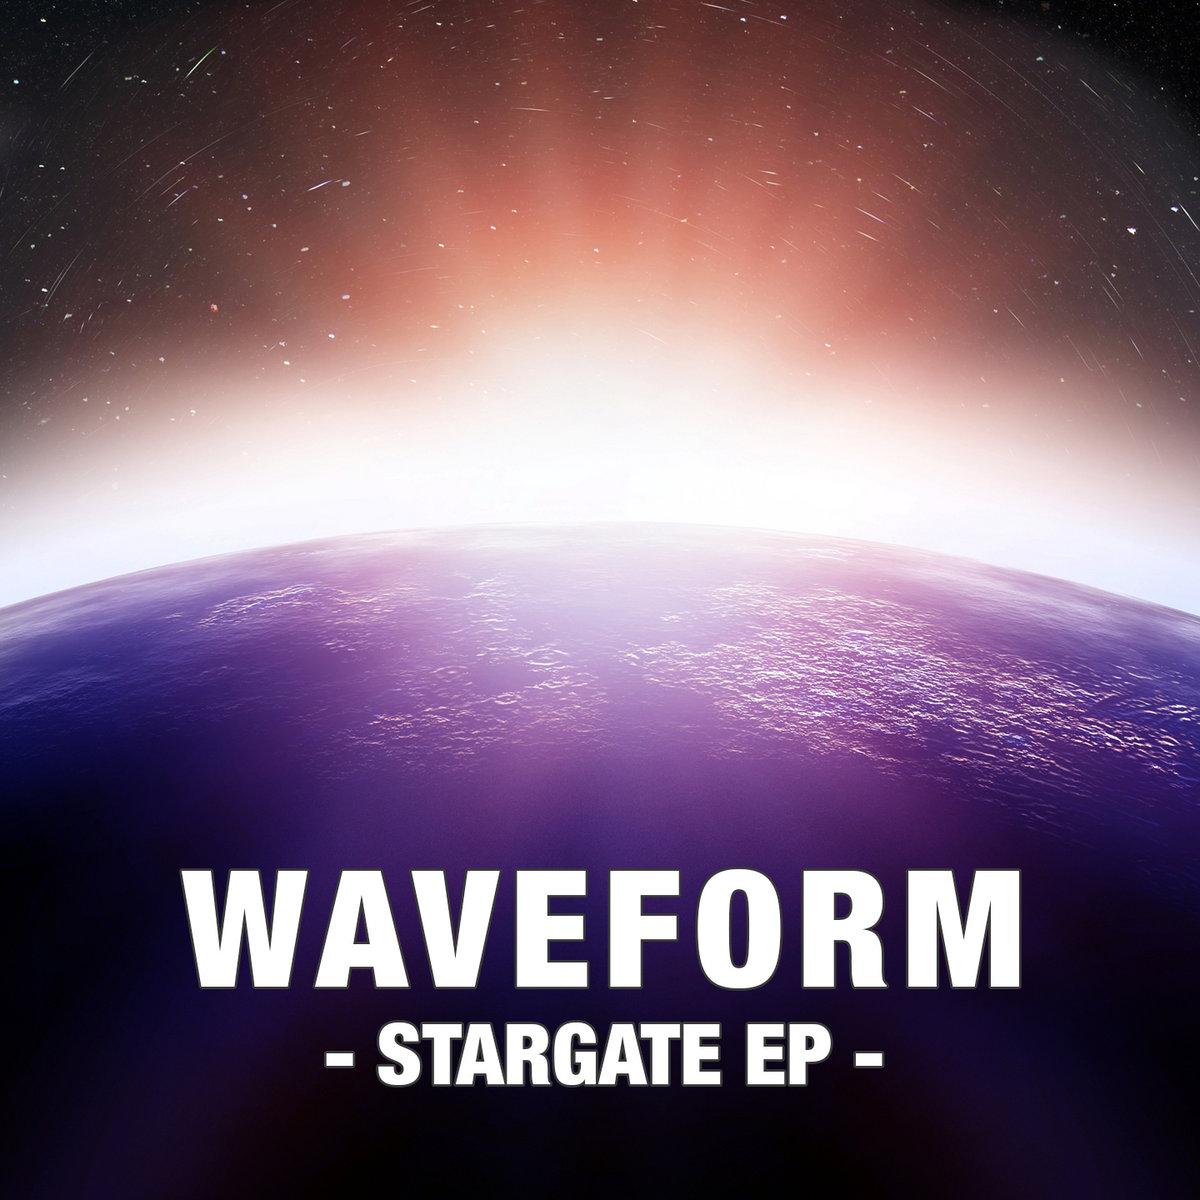 Waveform - Stargate EP | ov-silence Music